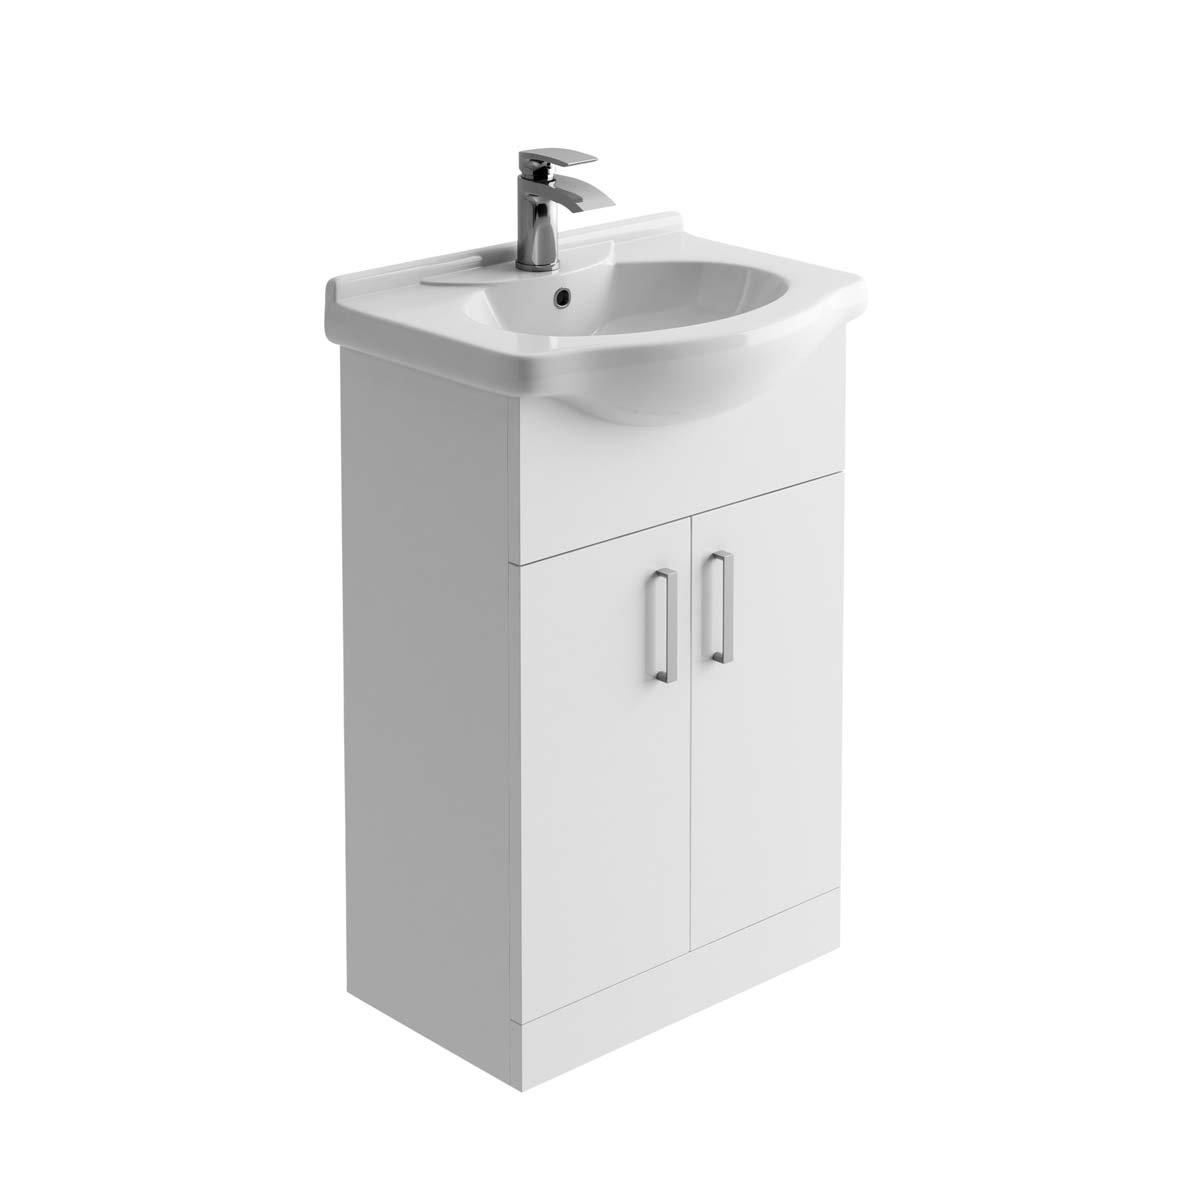 Denver Gloss White WC Toilet Unit Includes Concealed Cistern 50cm